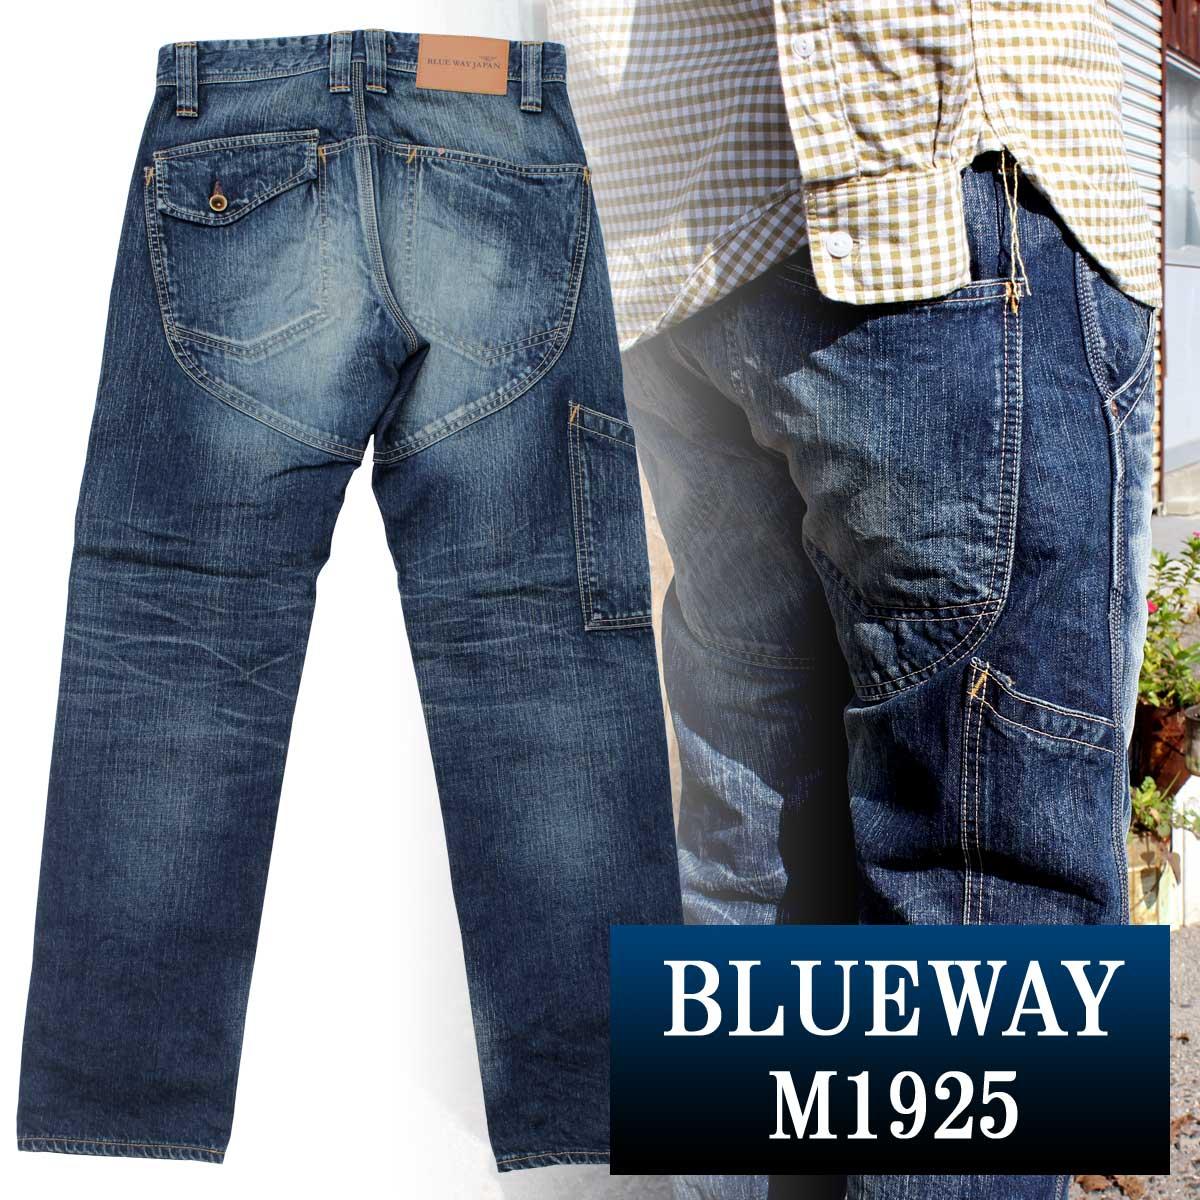 BLUEWAY:13.5ozビンテージデニム・ロガー ワークパンツ(オールドブルーブリーチ):M1925-4654 ブルーウェイ ジーンズ メンズ デニム ジーパン 裾上げ ストレート